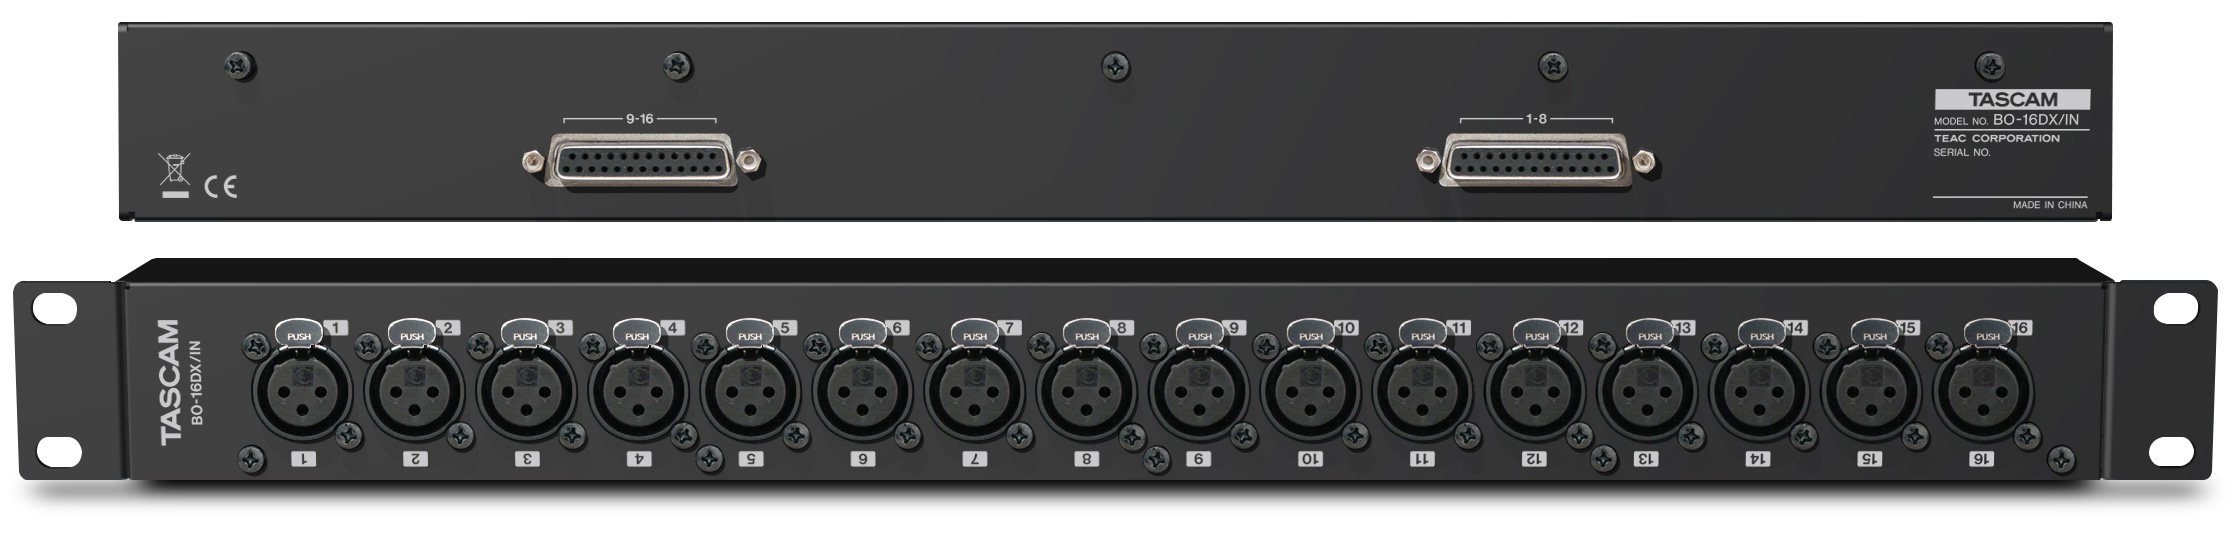 Tascam Breakout Box with 16 Balanced In XLR-F - 2xSUB-D25